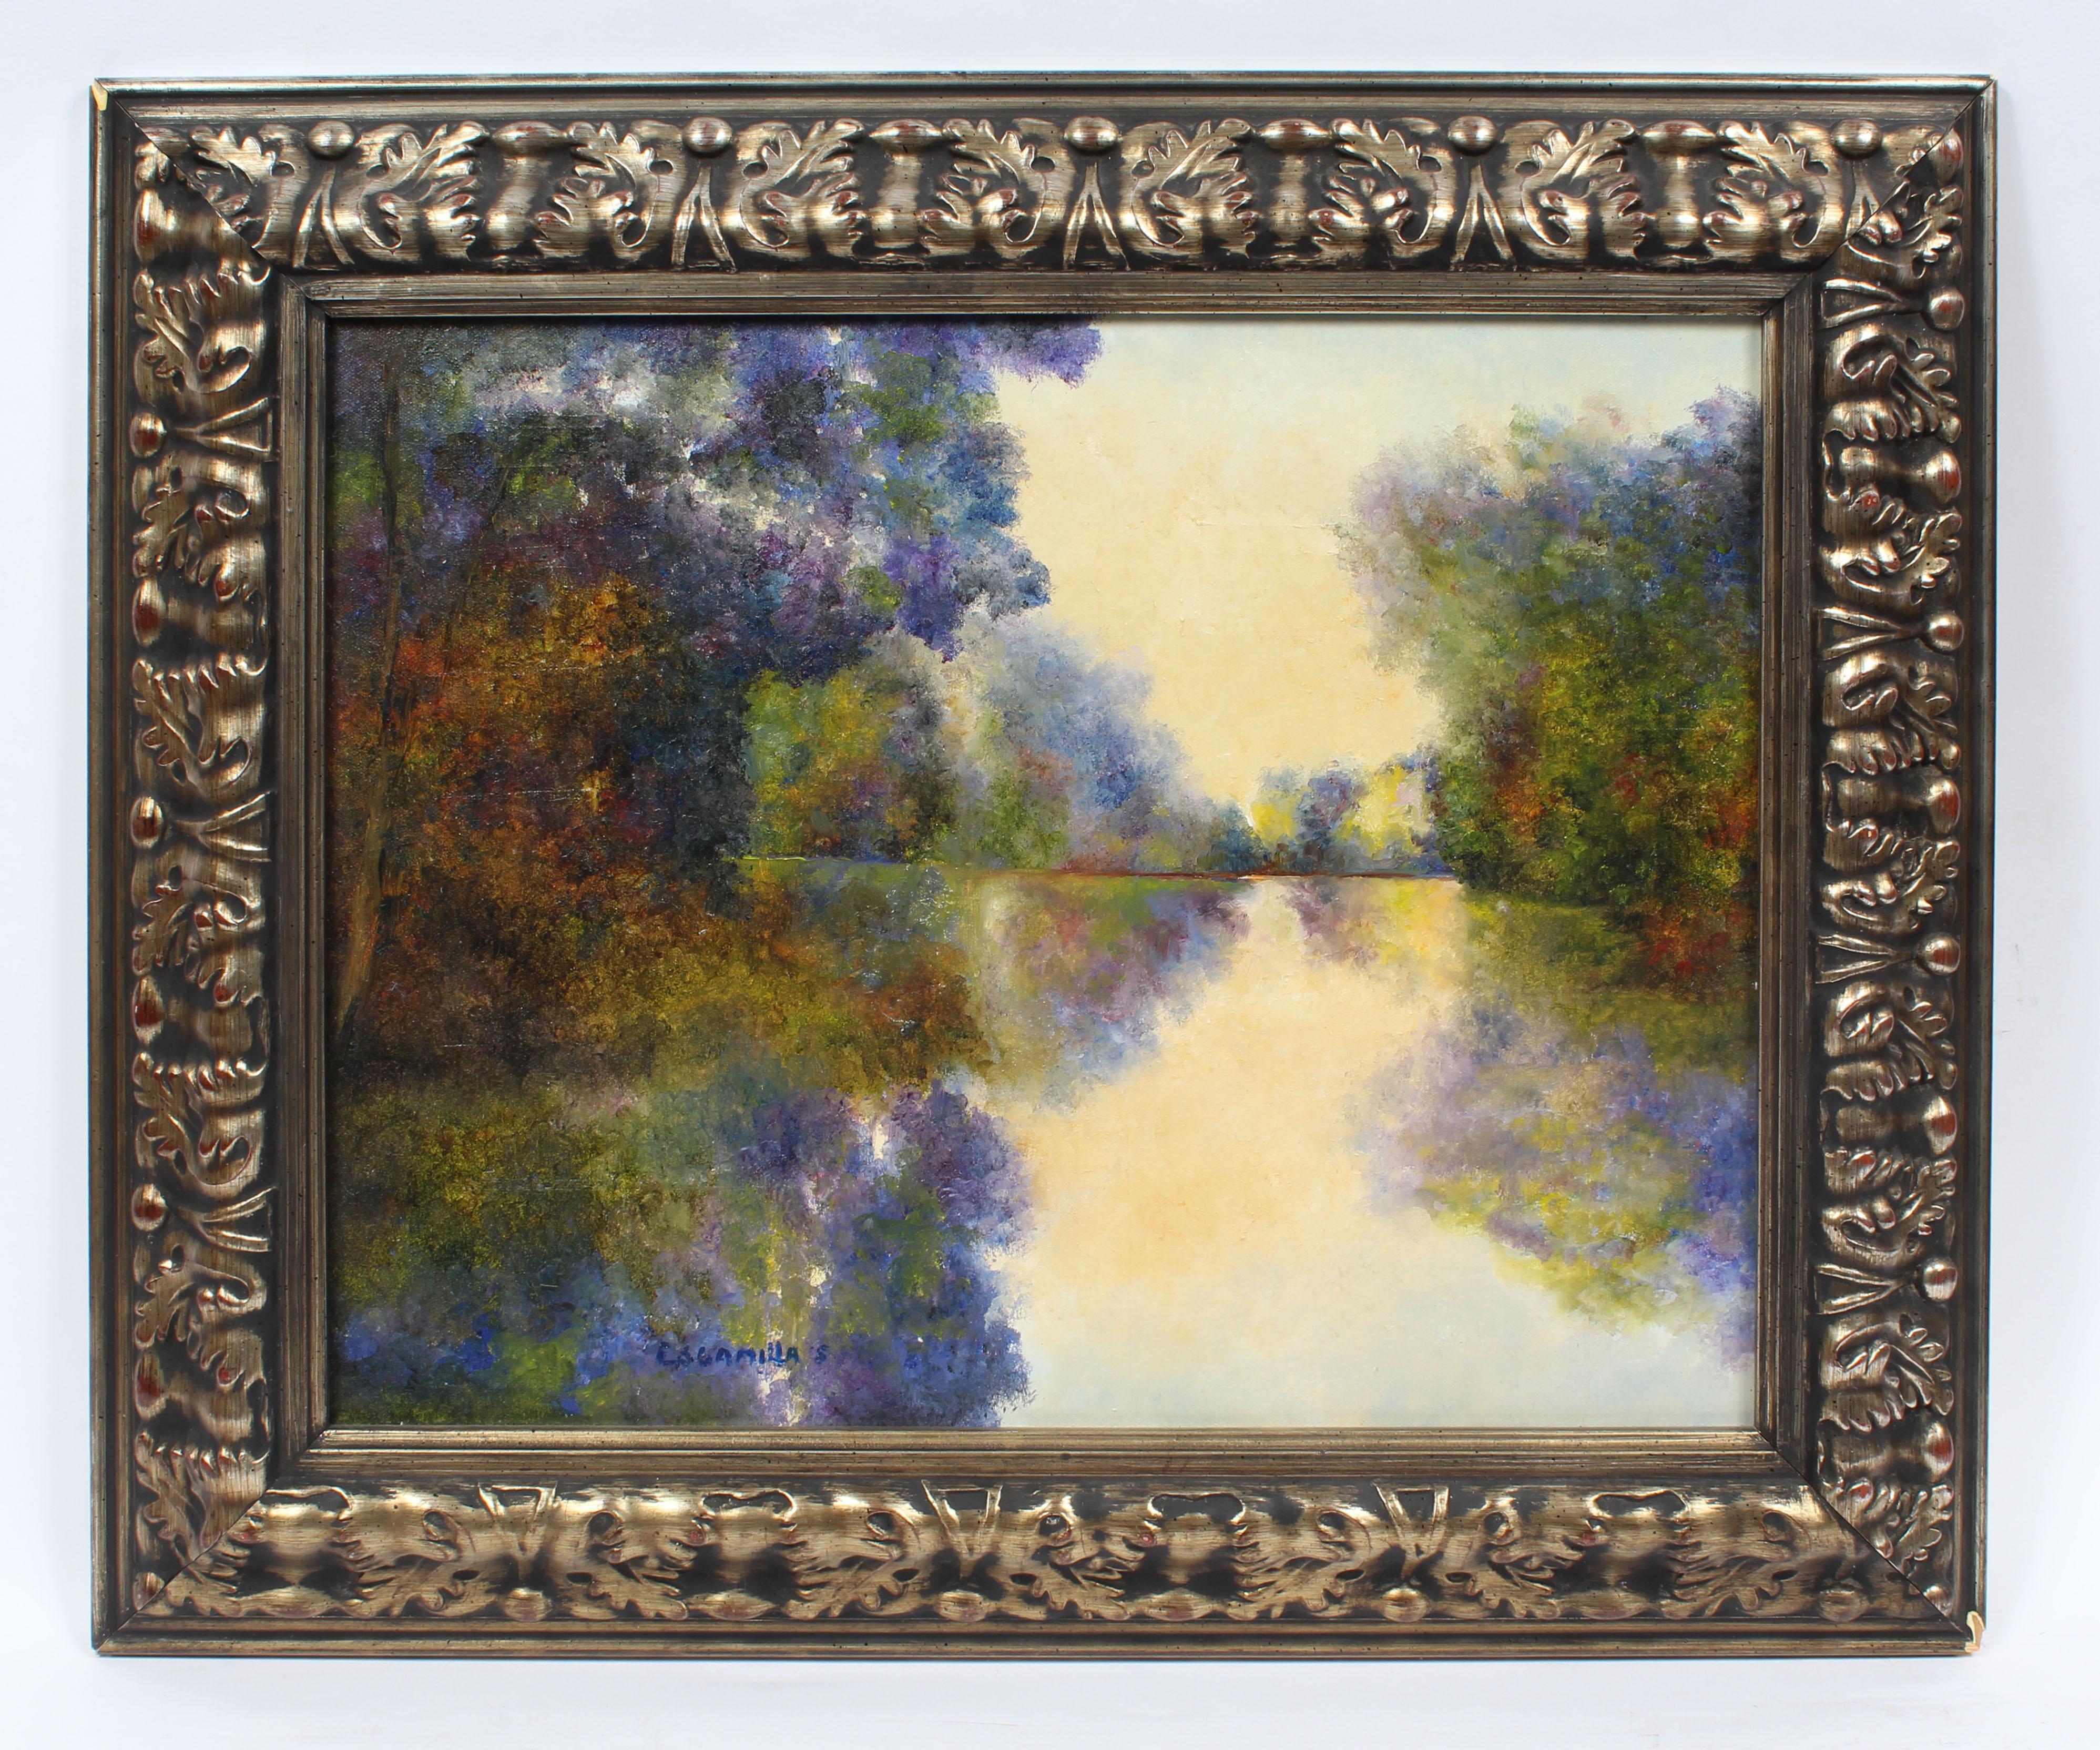 Vintage Impressionist Flower Filled River Southern School Original Oil Painting